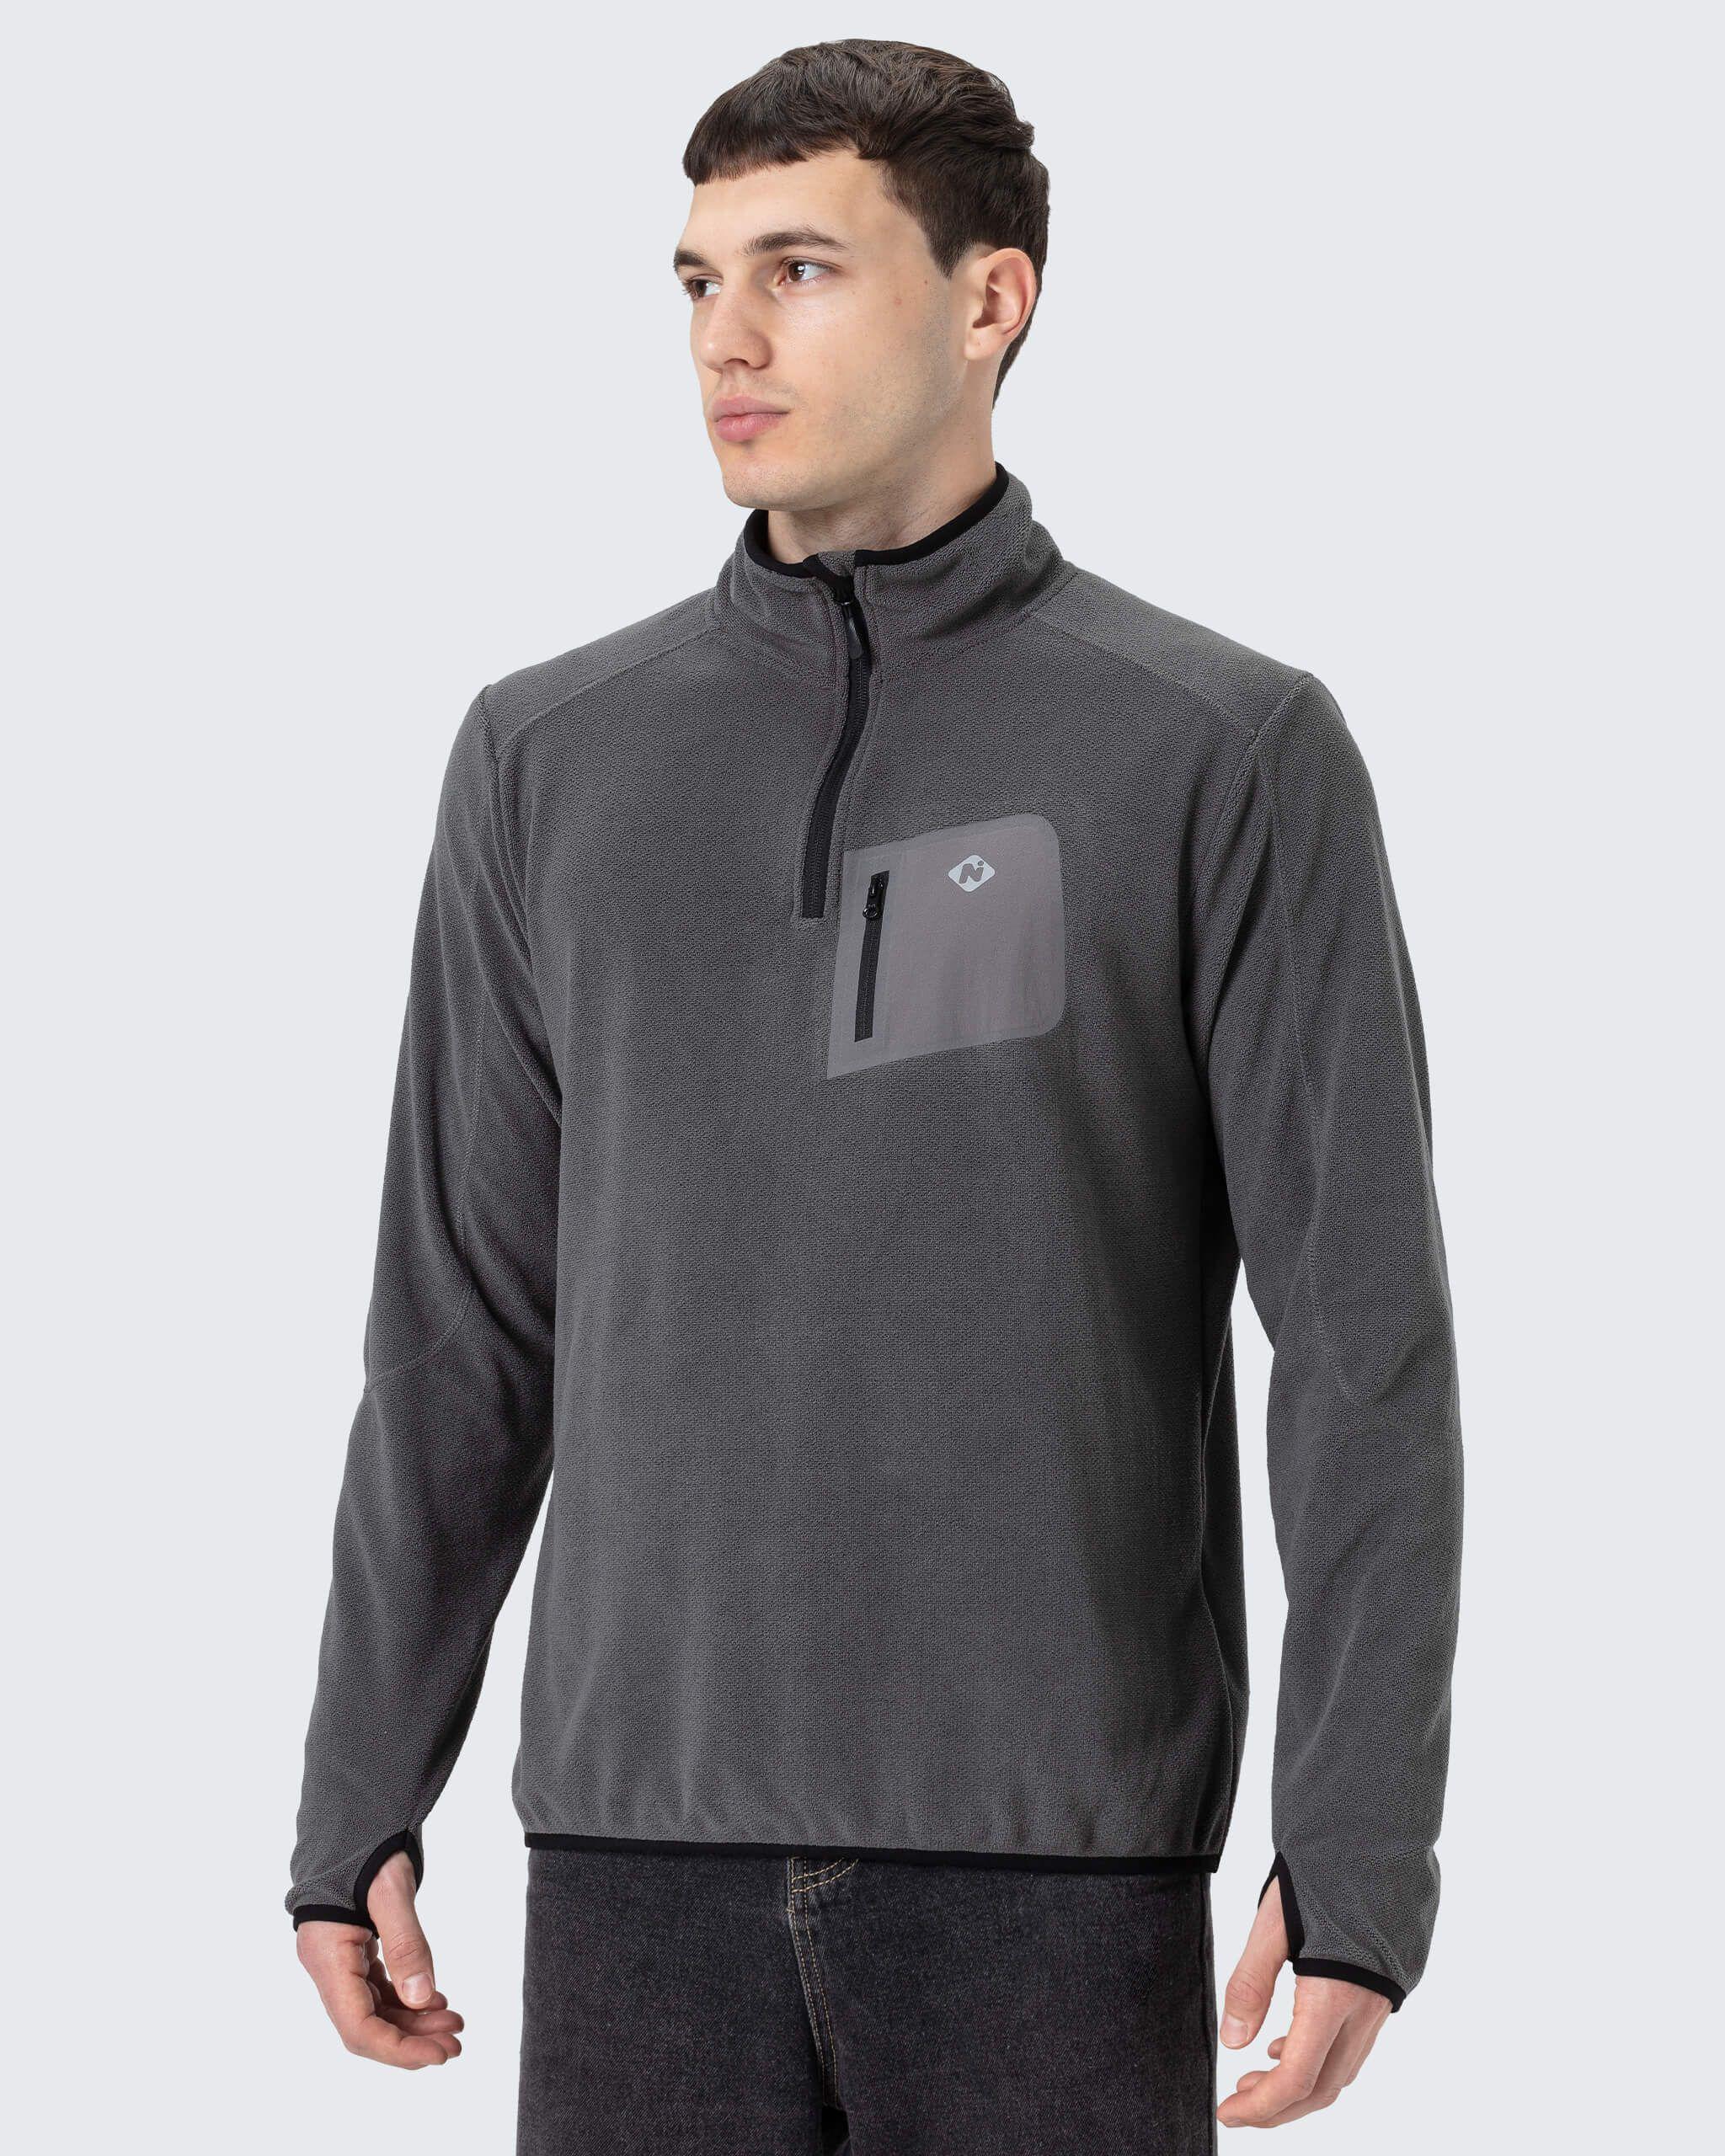 1/4 Zip Pullover Running Shirt in 2020 Running shirts